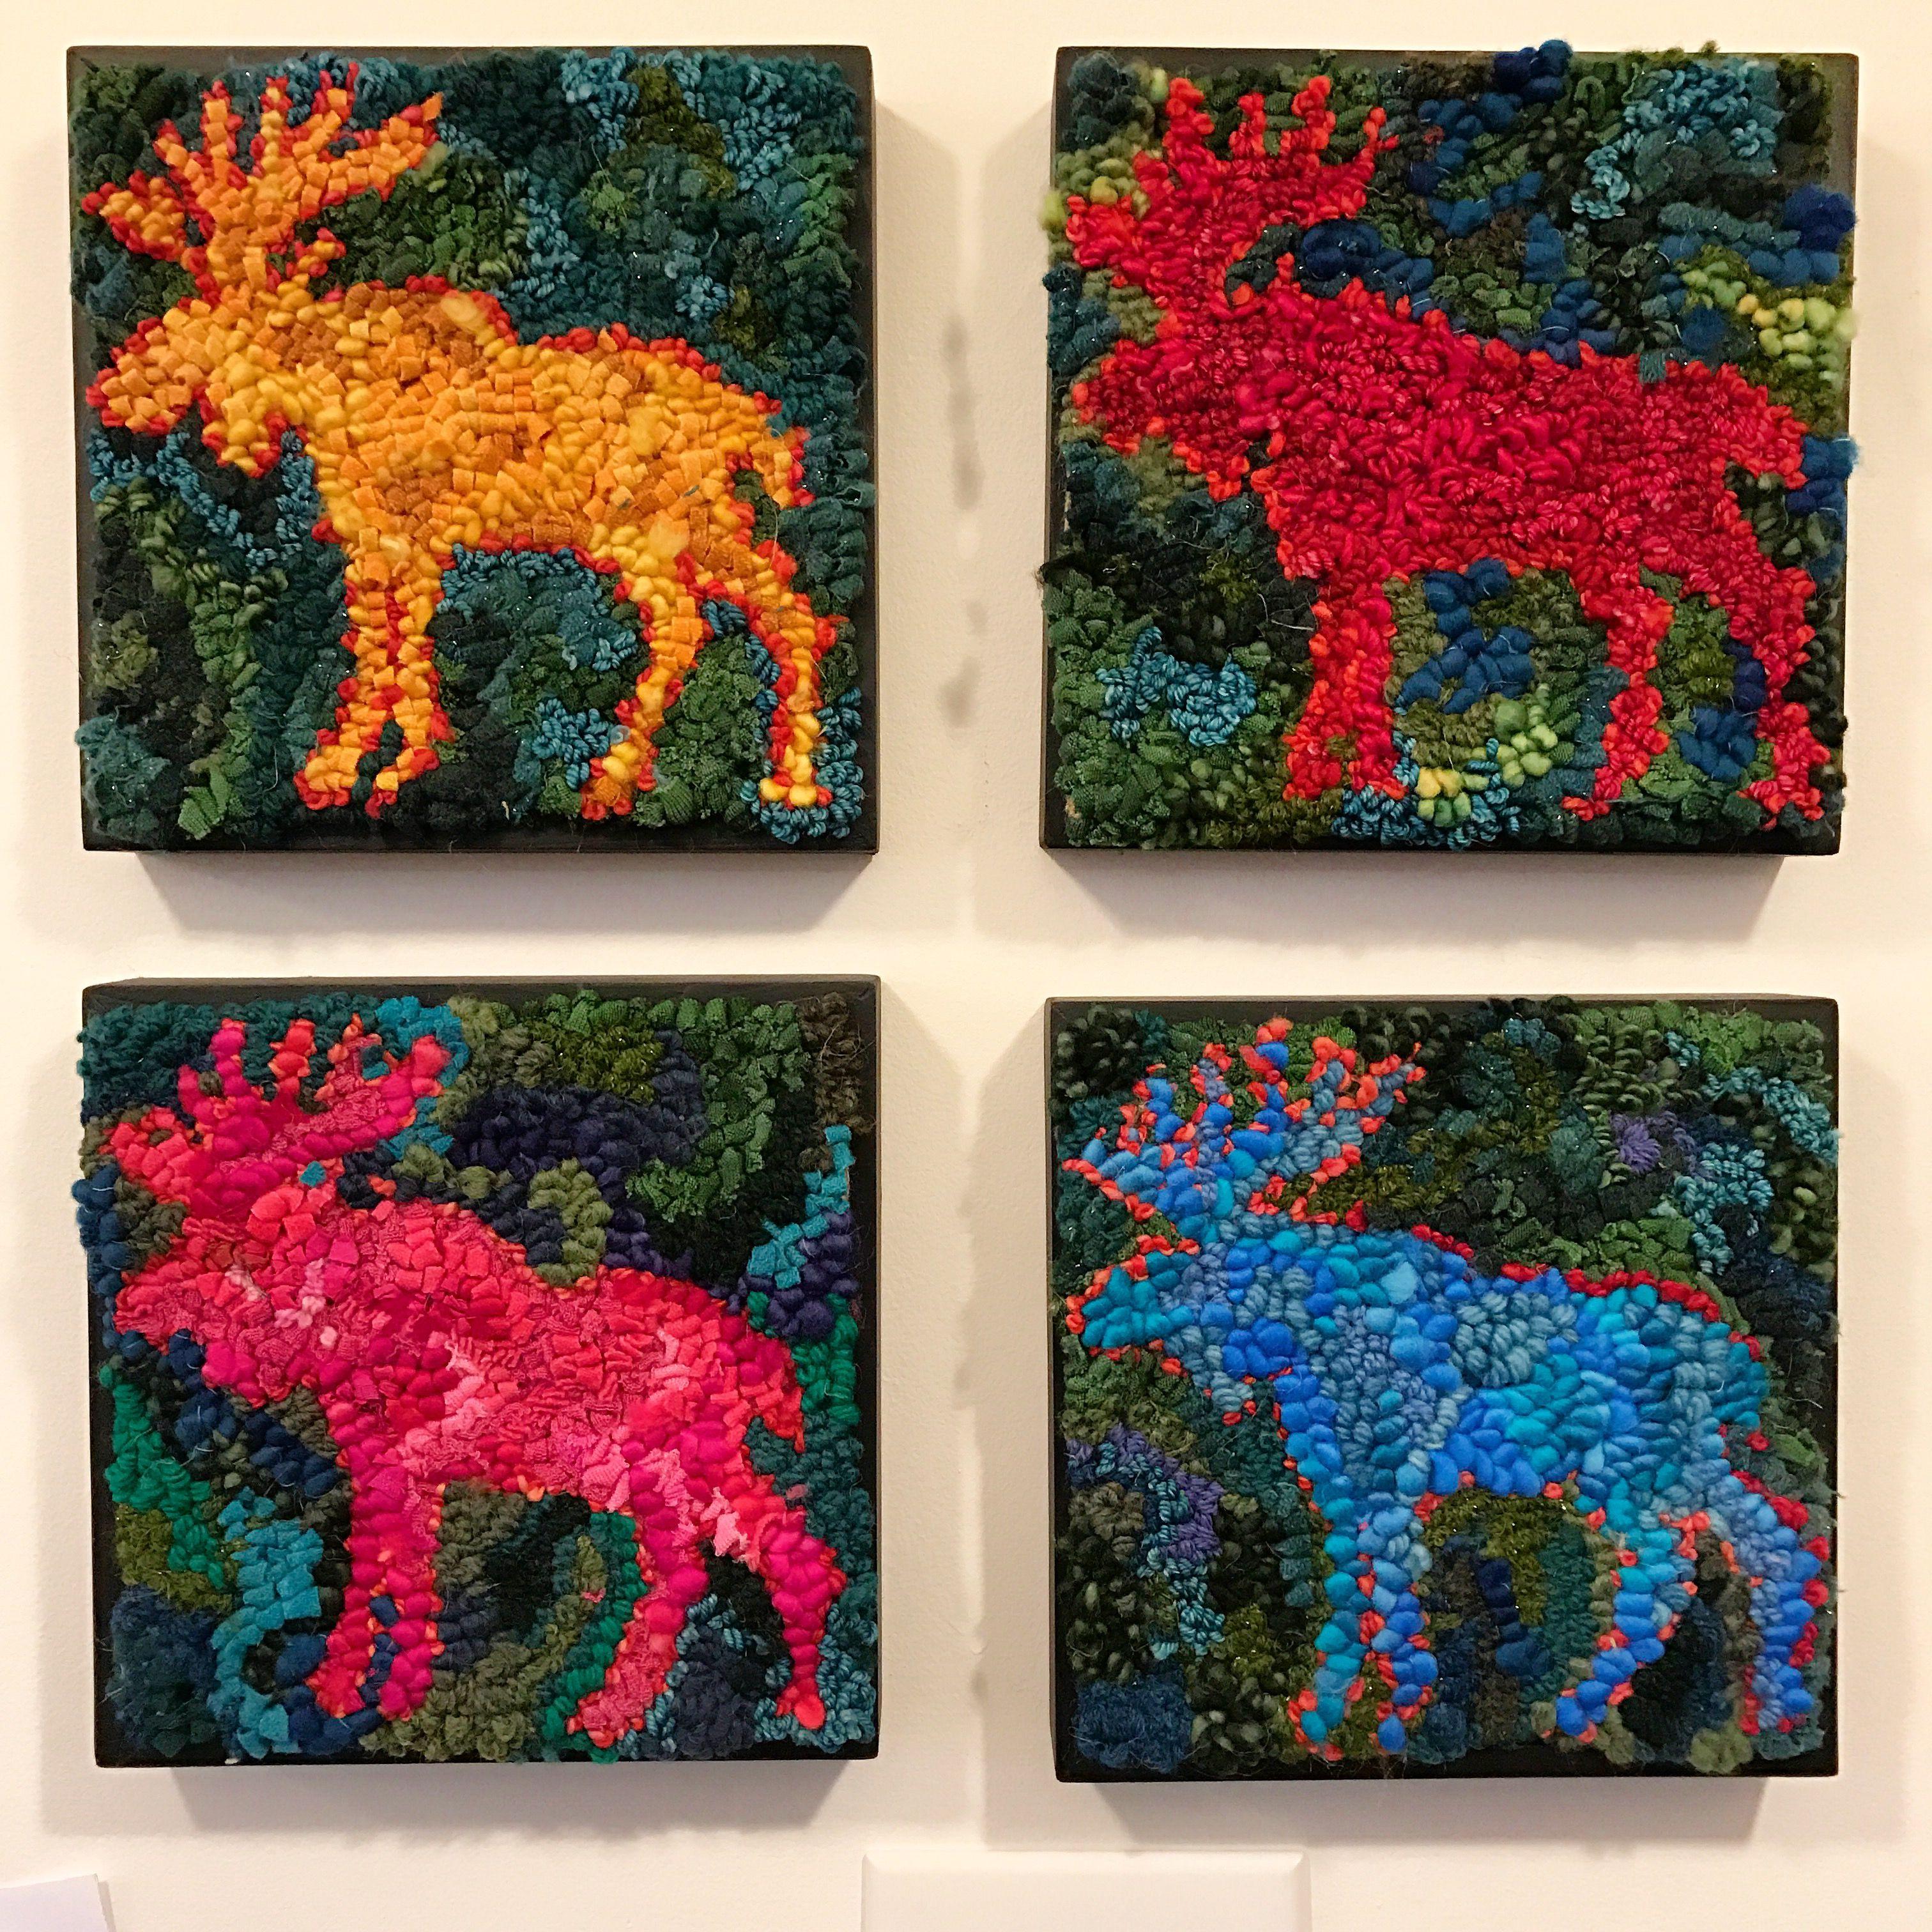 Moose Rug Hooking Kit: Colorful Mooses By Deanne Fitzpatrick. Orange, Red, Hot